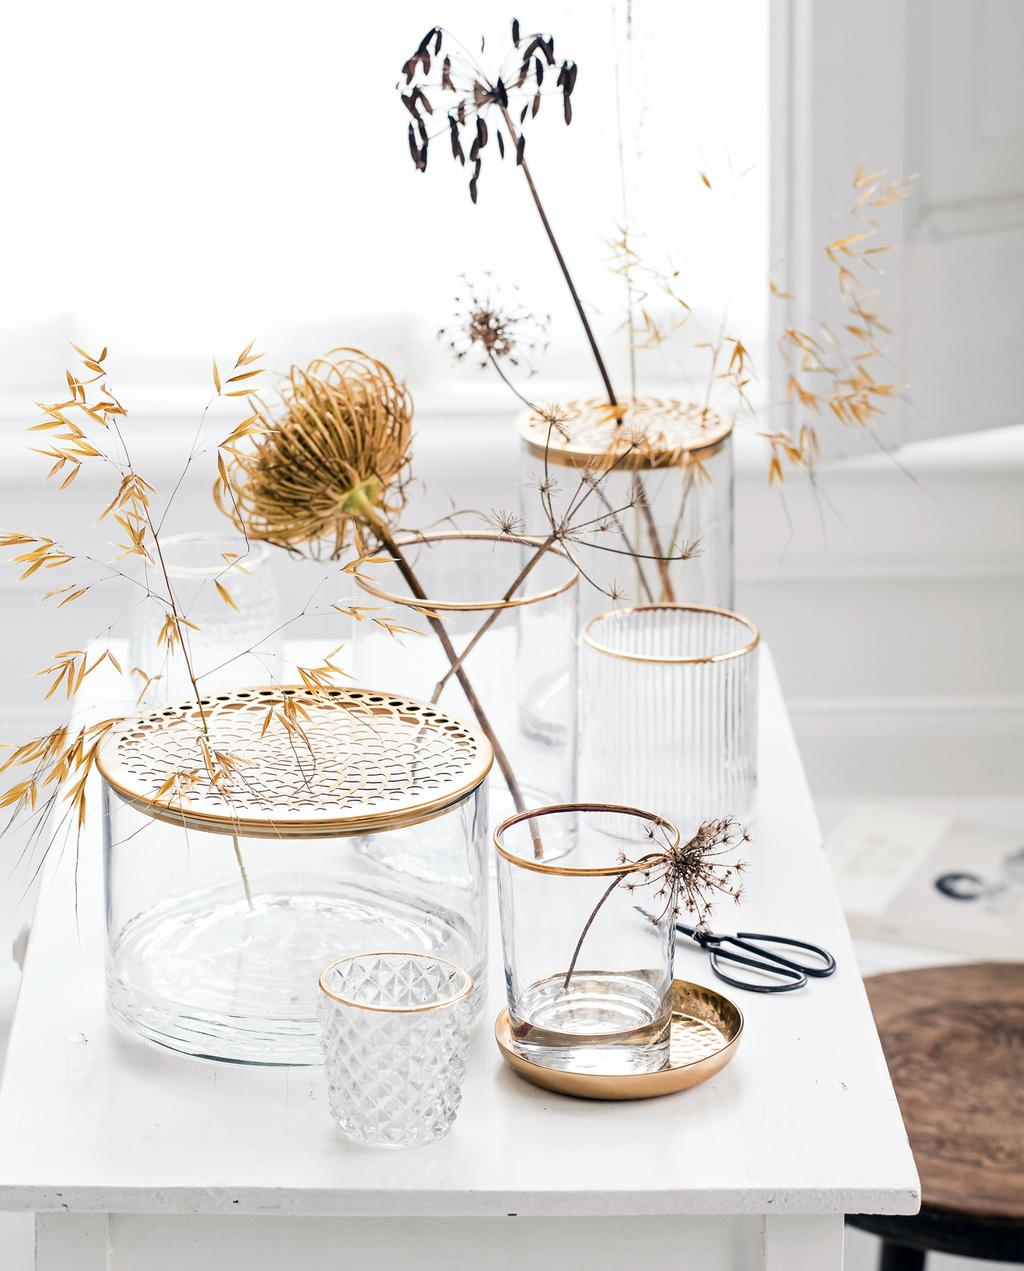 vtwonen 2-2020 | glazen vazen en potten